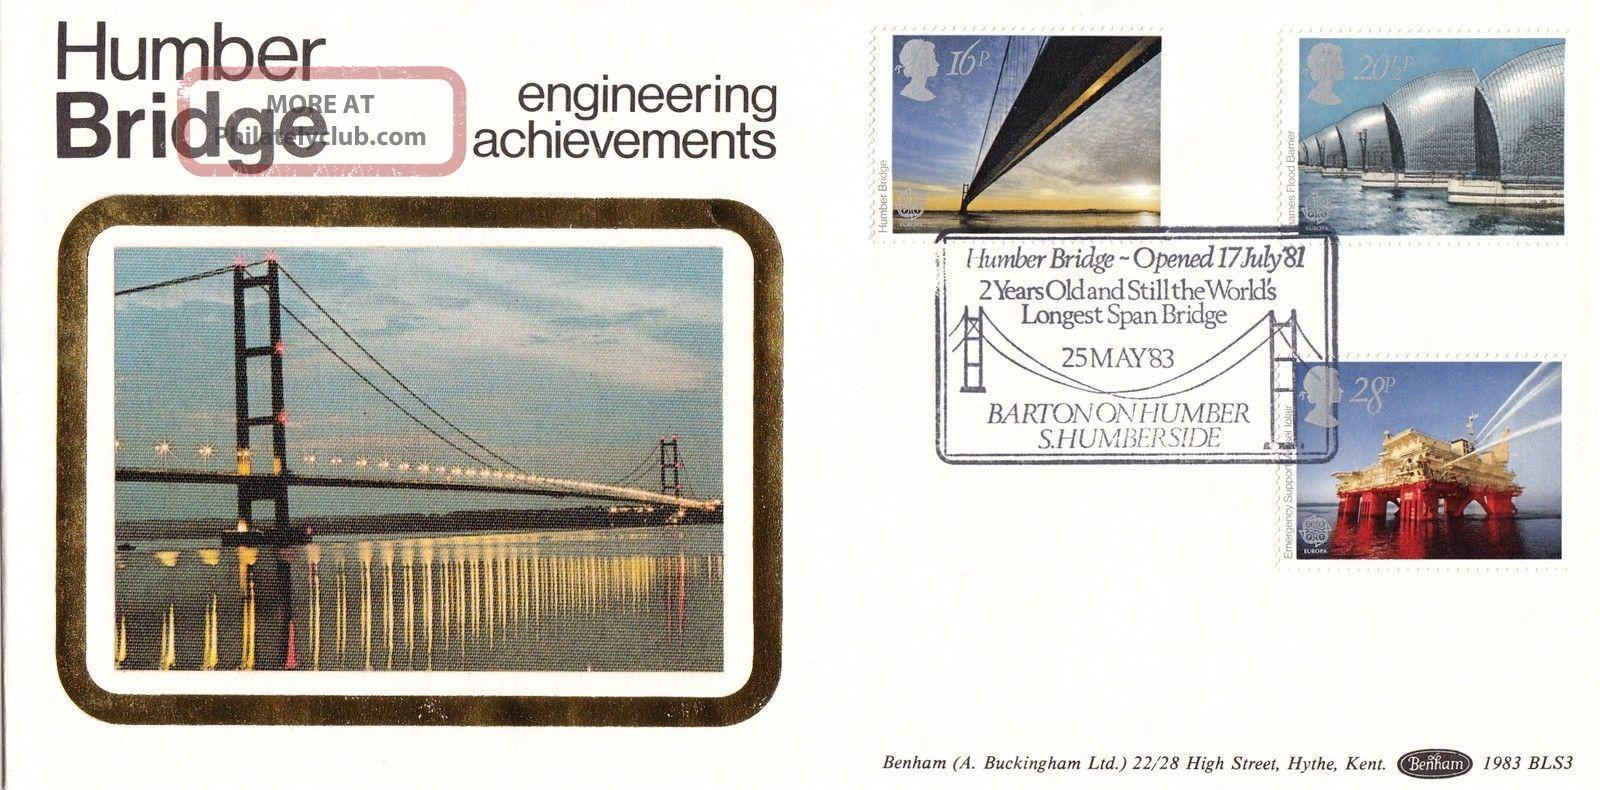 (24405) Gb Benham Fdc Engineering / Humber Bridge / Oil Rig - Barton 25 May 1983 1971-Now photo